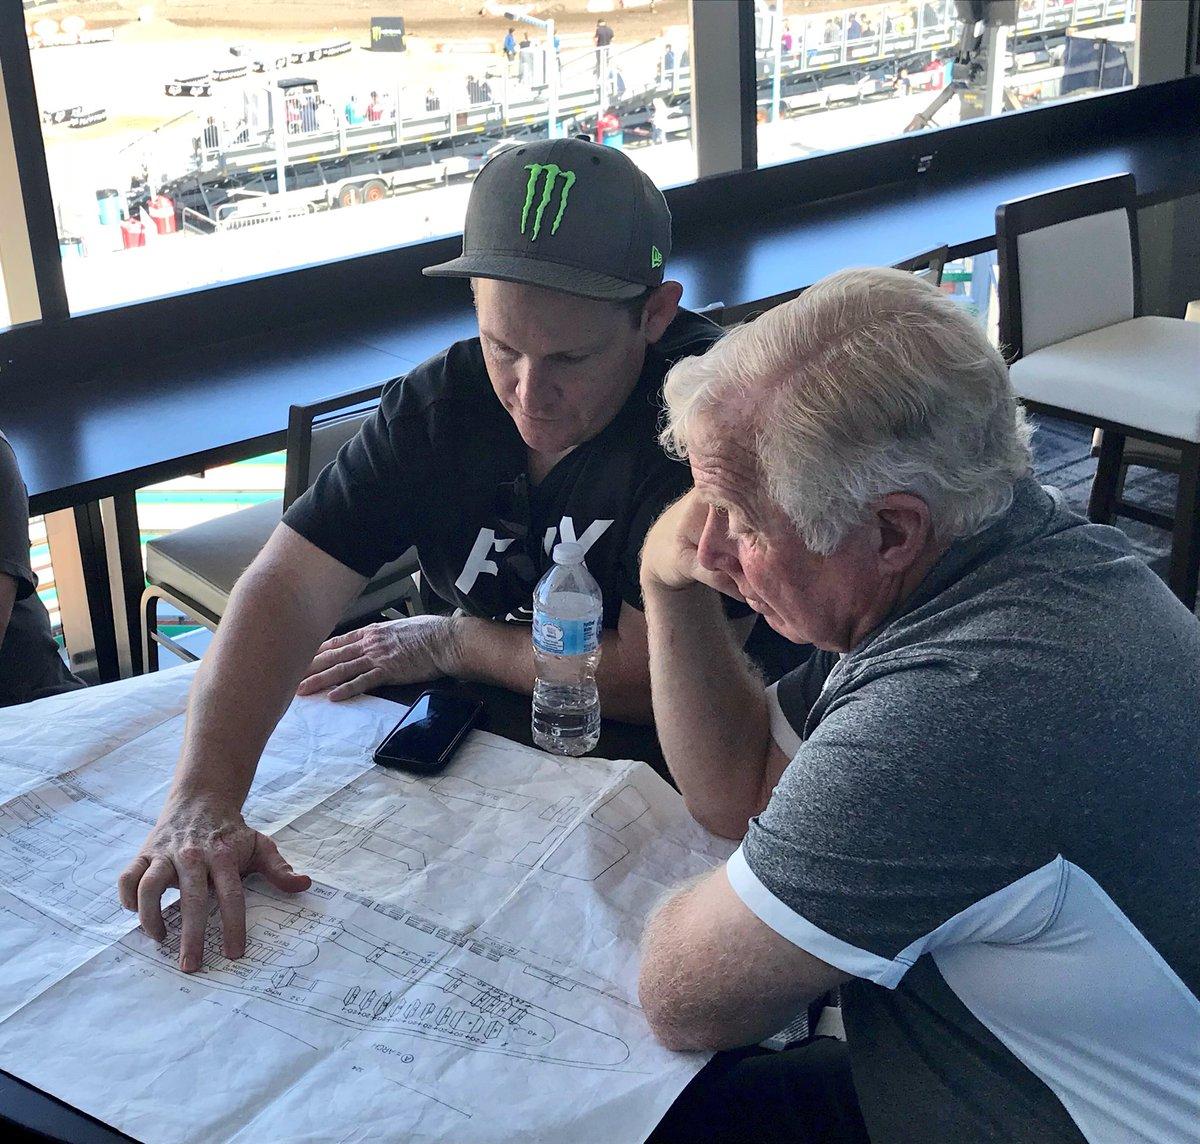 On to the next! 🤘  @RickyCarmichael is already hard at work designing the 2019 #DAYTONASX course!